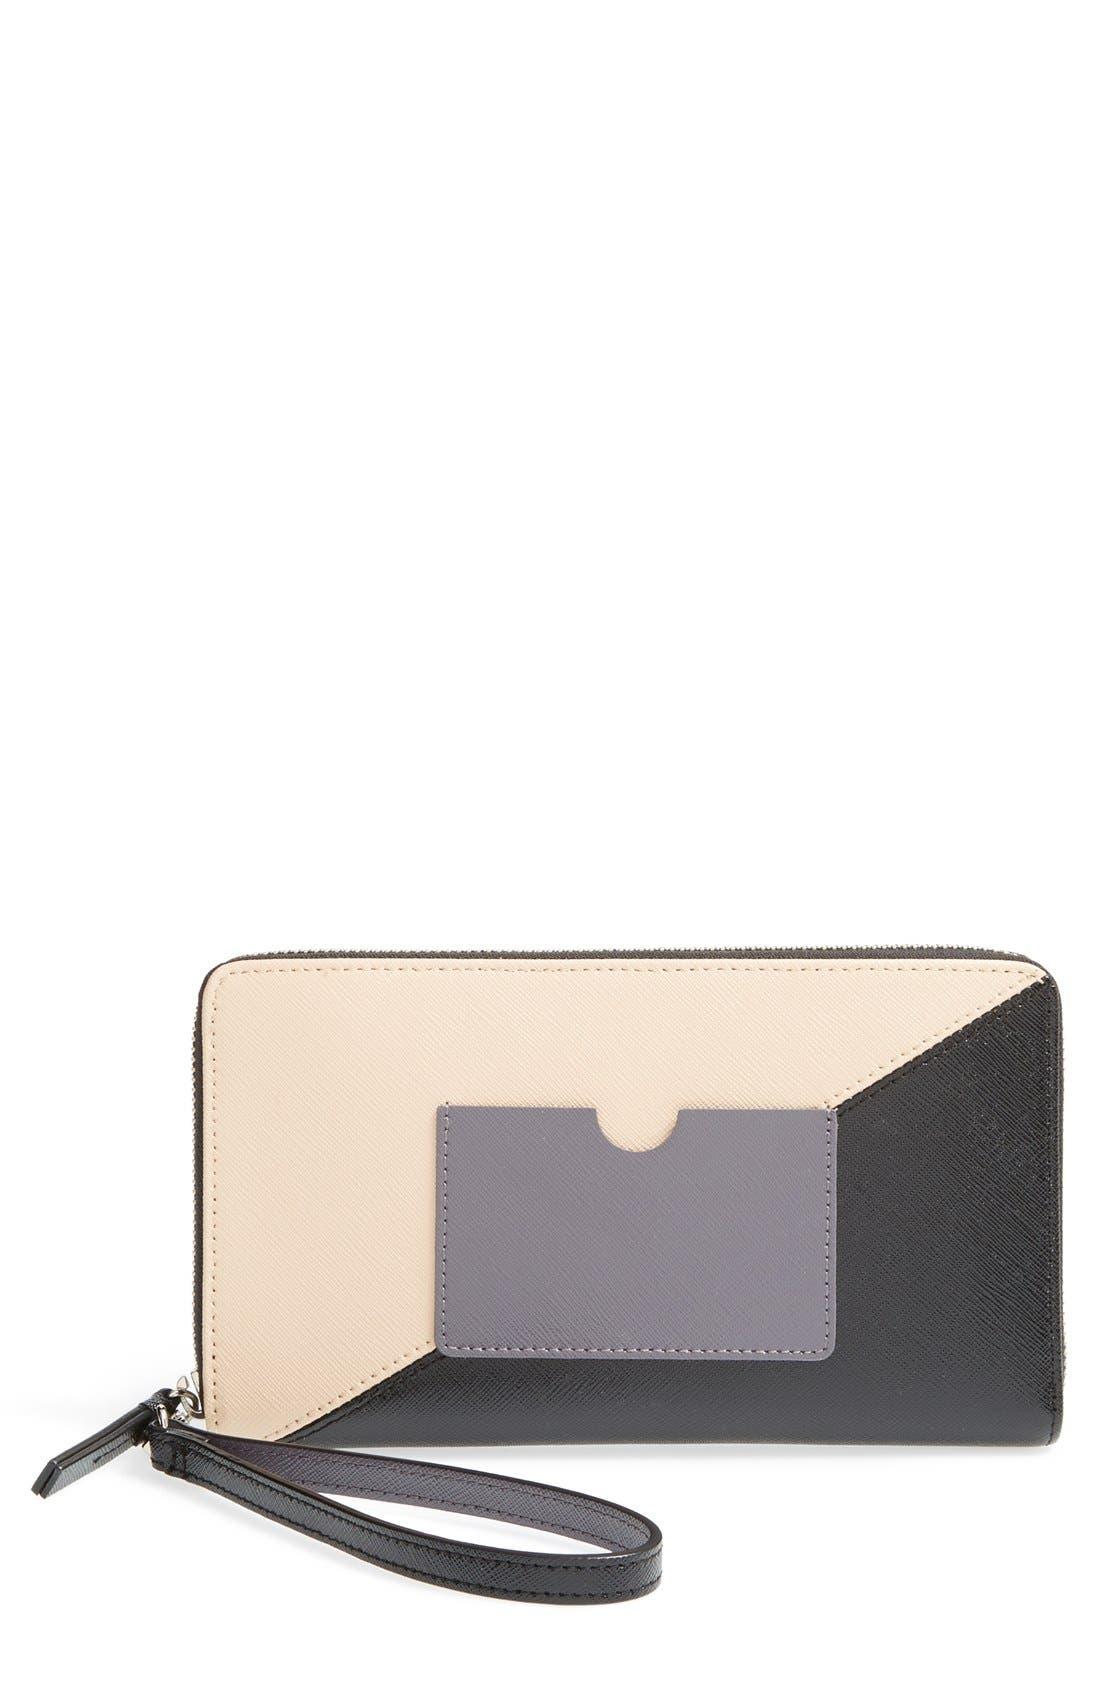 Alternate Image 1 Selected - Halogen® Saffiano Leather Zip Around Wallet